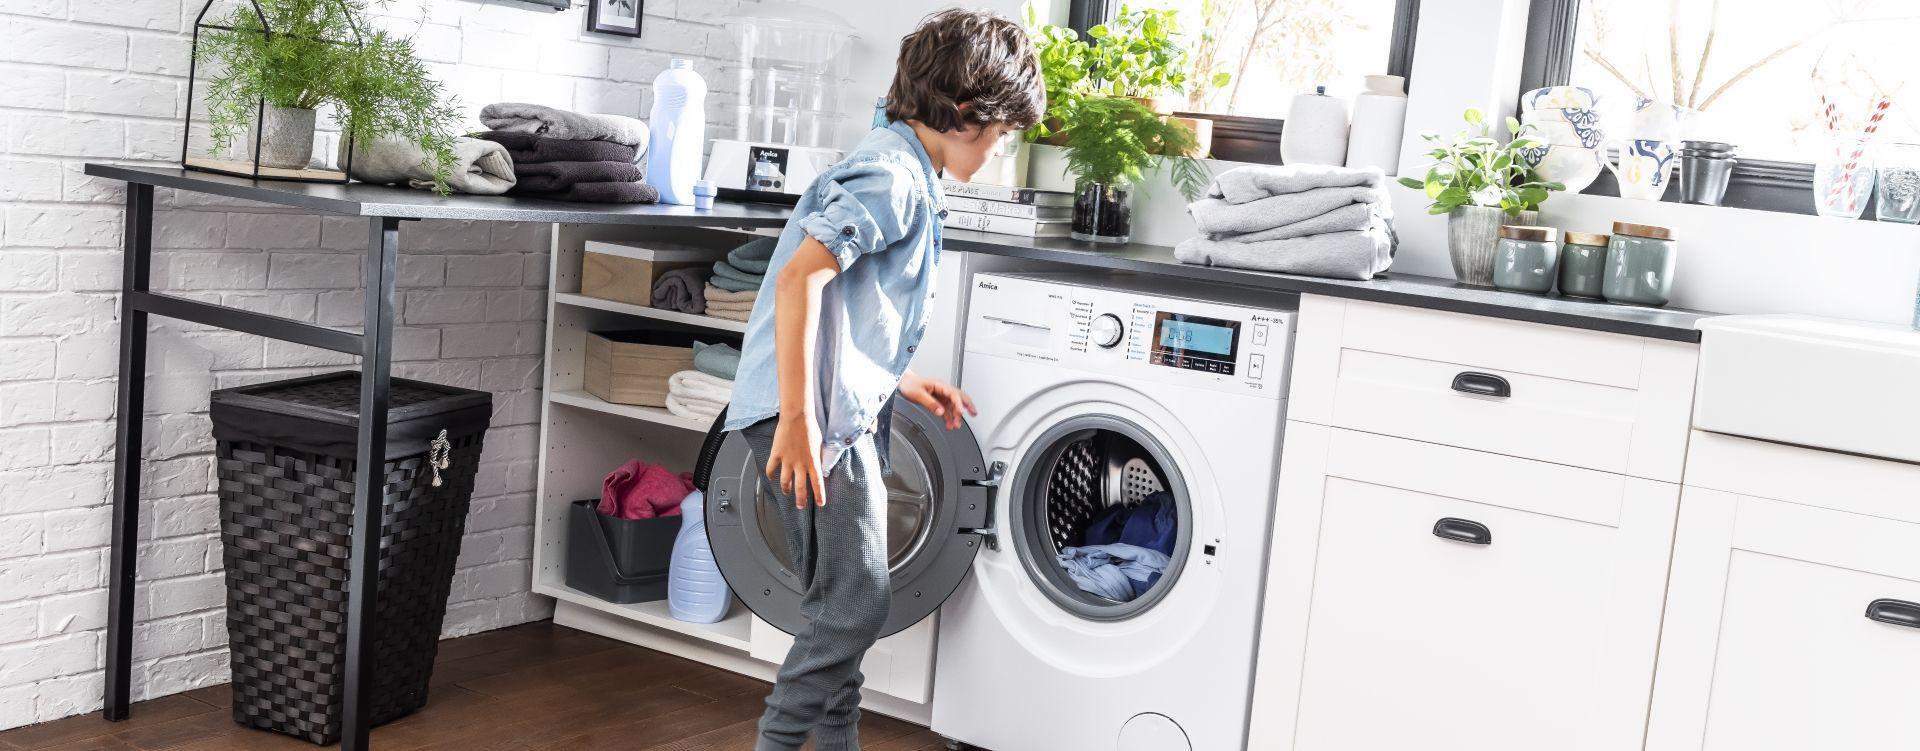 Freestanding Amica Washing Machine